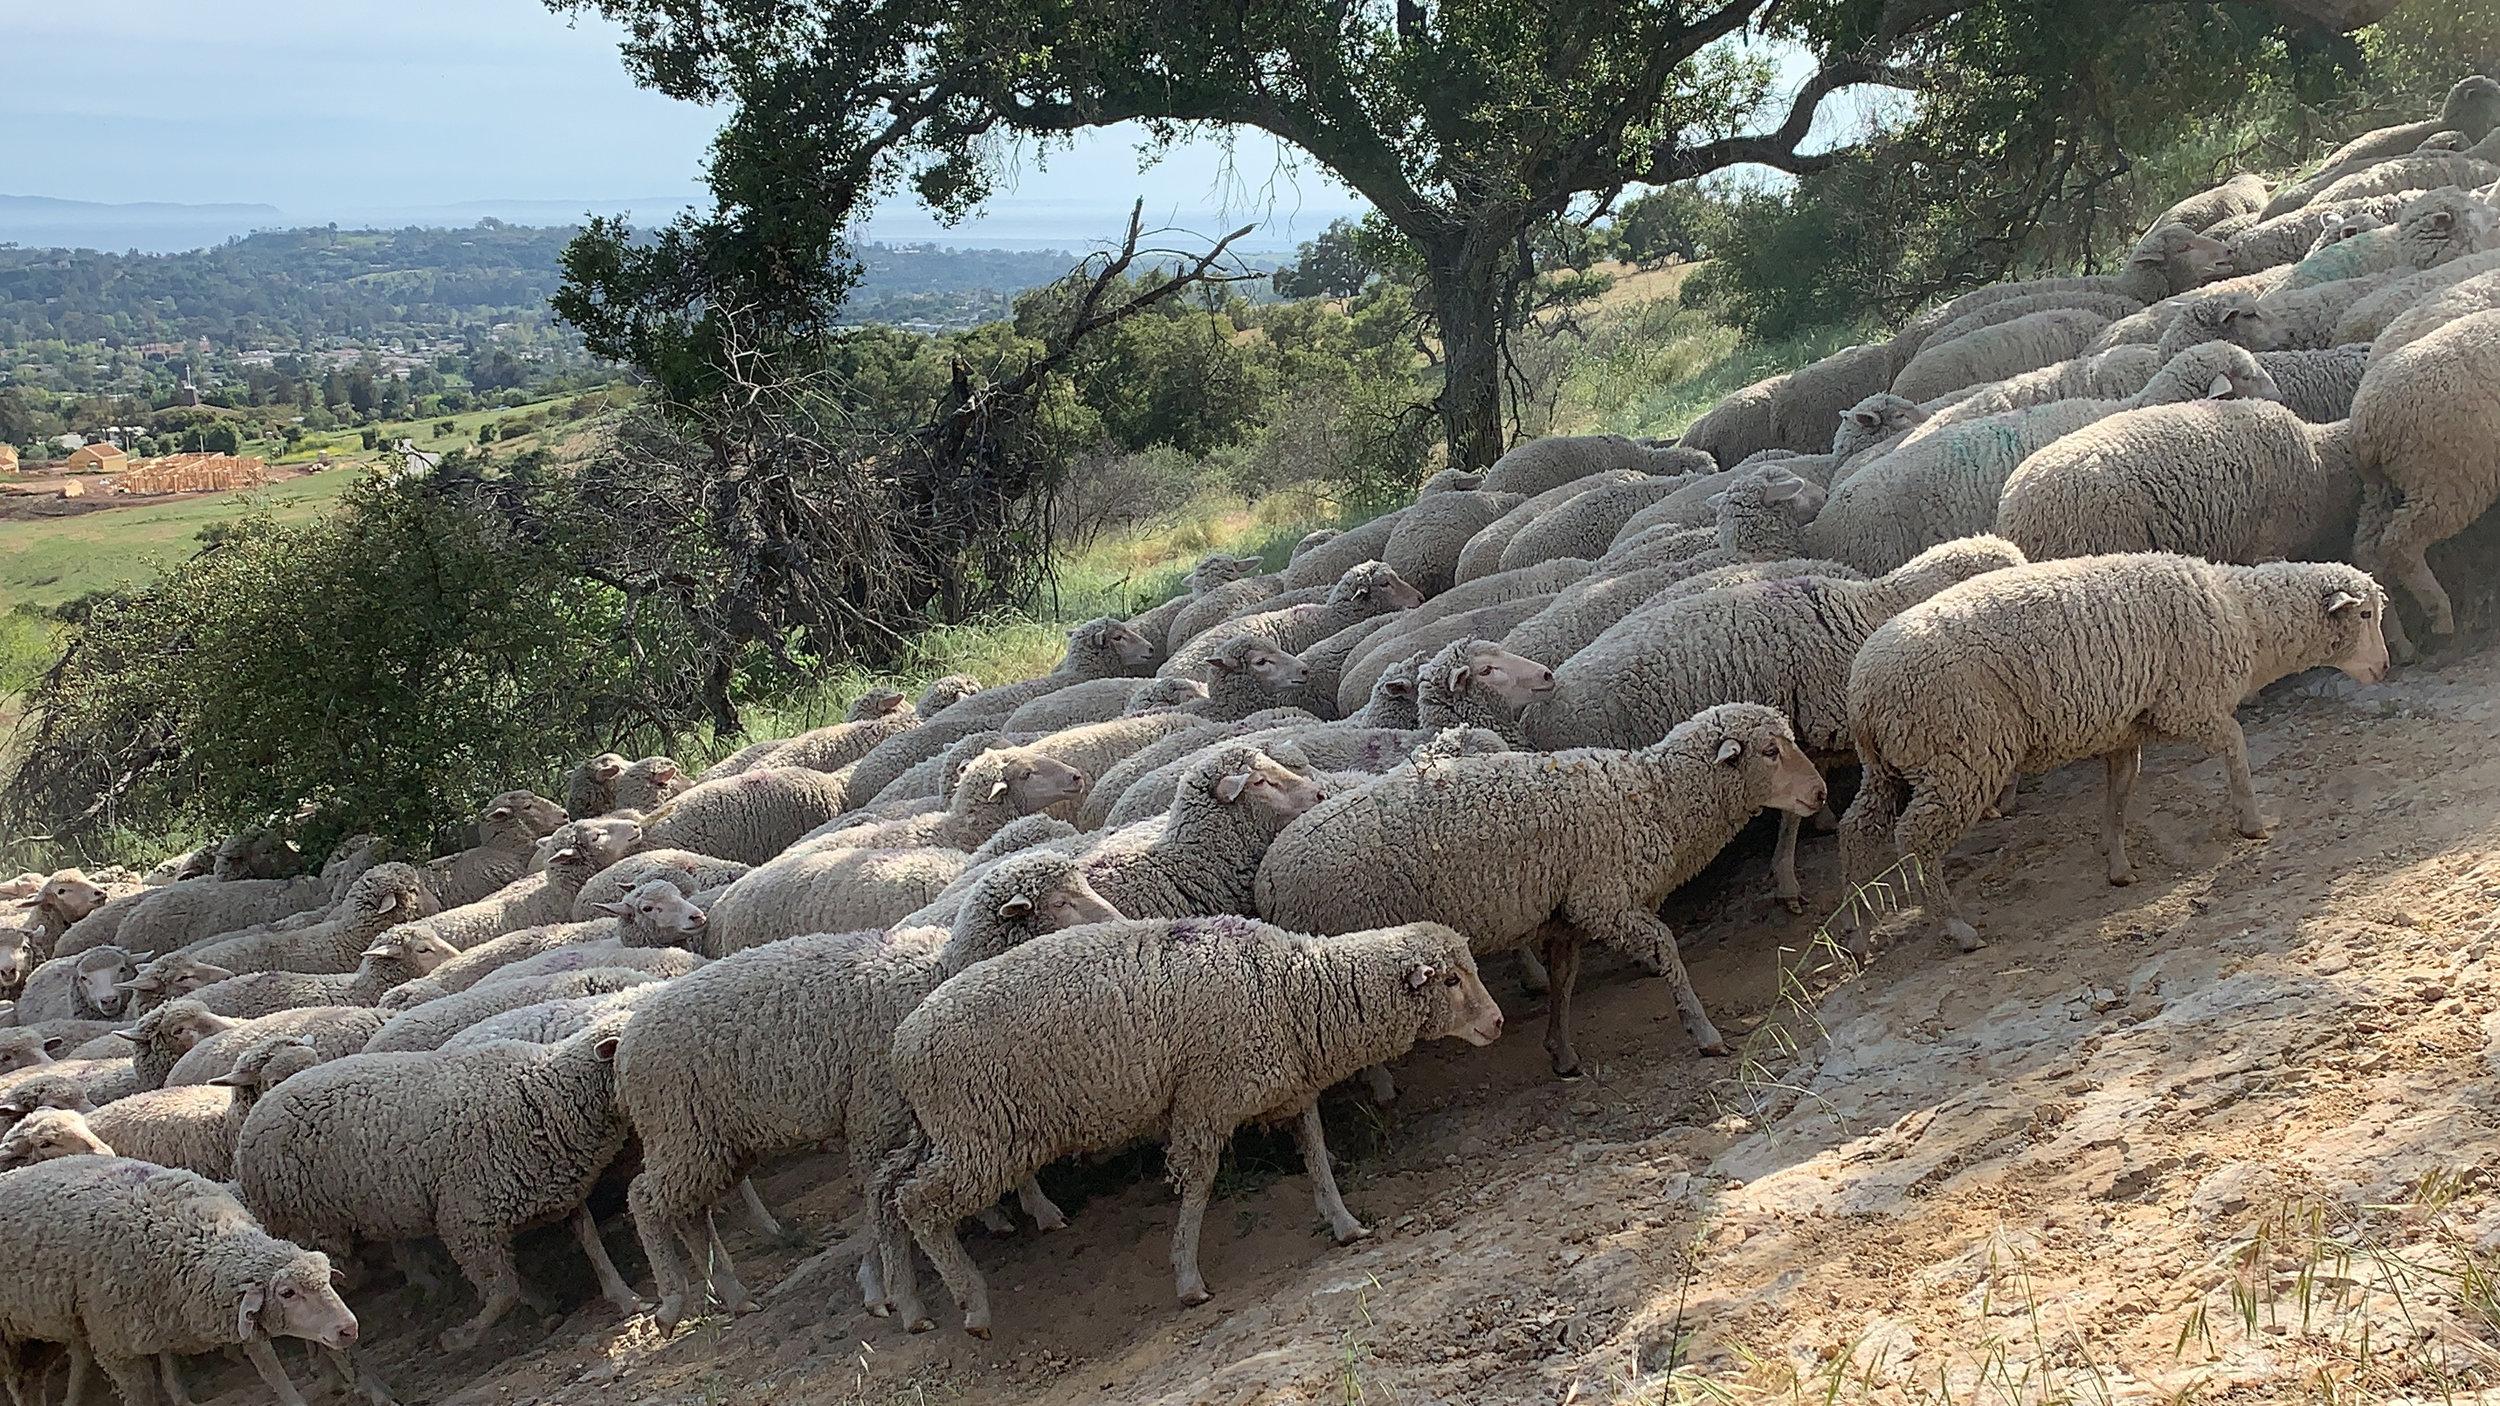 Sheep being herded between grazing areas.